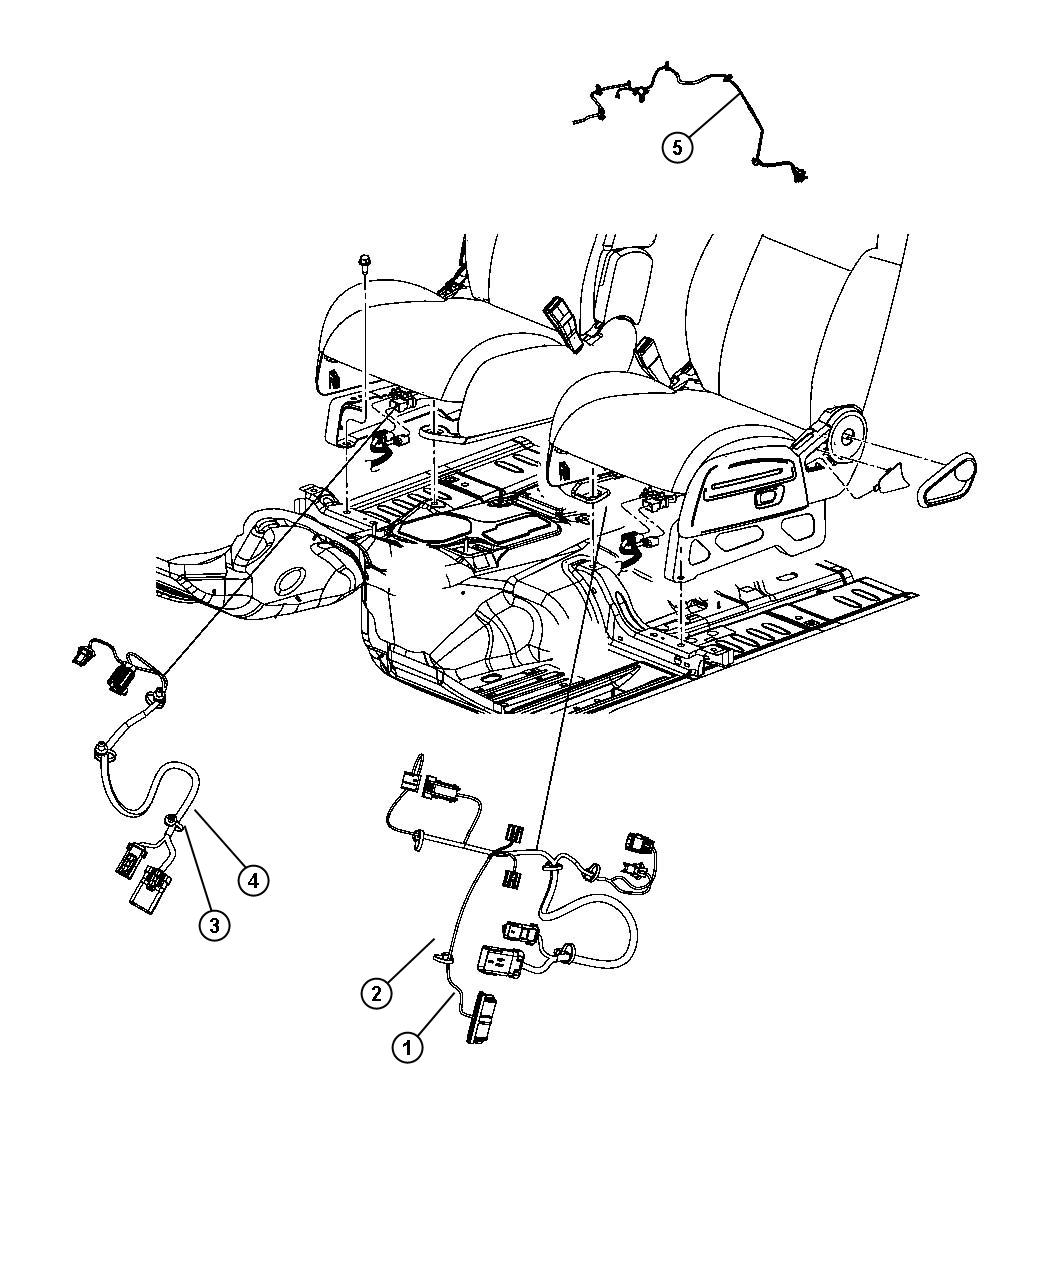 Jeep Liberty Wiring. Power seat. 2 way, heated. Trim